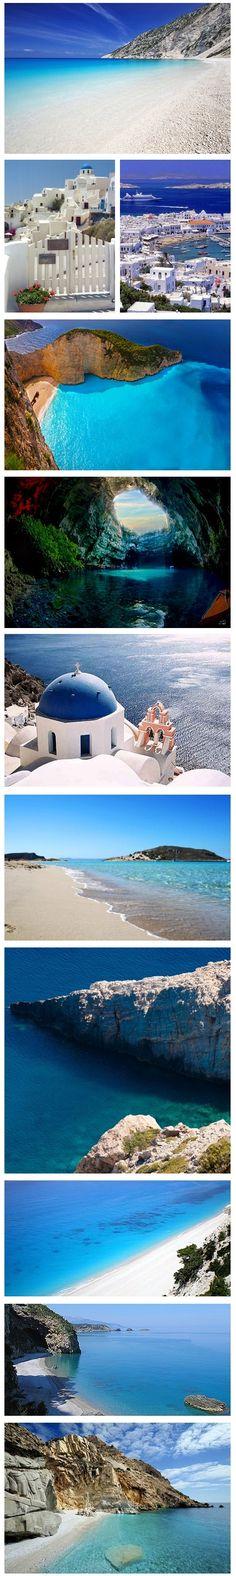 #voyage #travel #grece